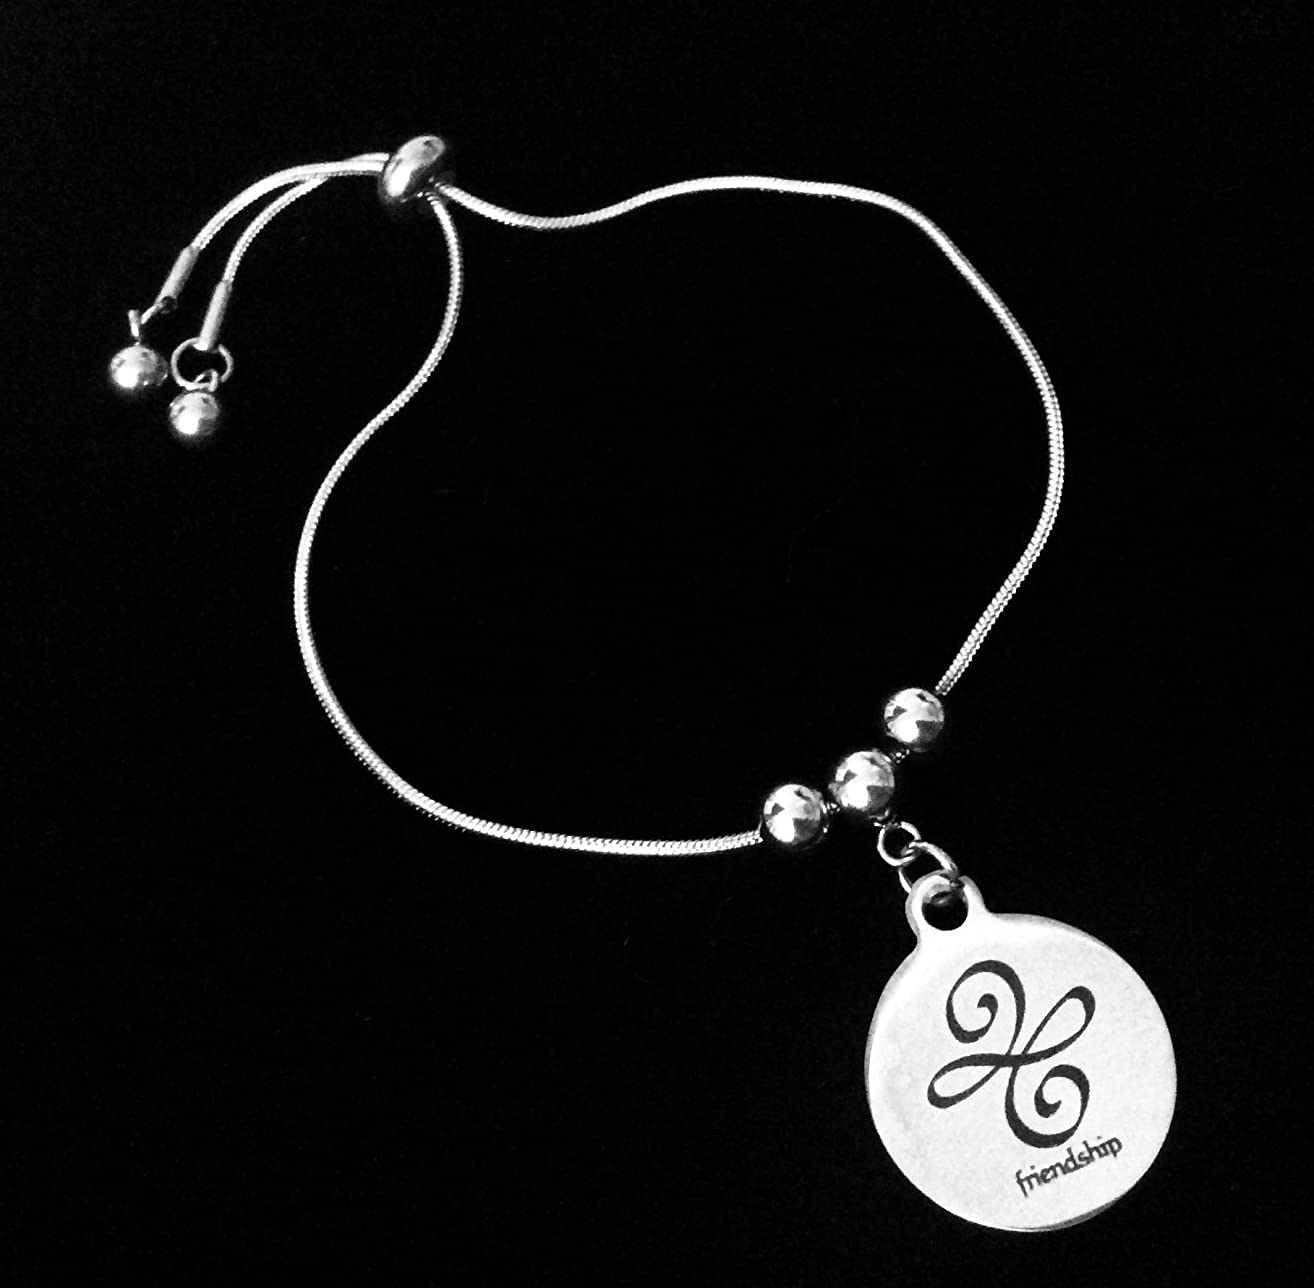 Friendship Symbol Sign Bolo Bracelet Stainless Steel Adjustable Bracelet Slider Chain One Size Fits All Gift Best Friend